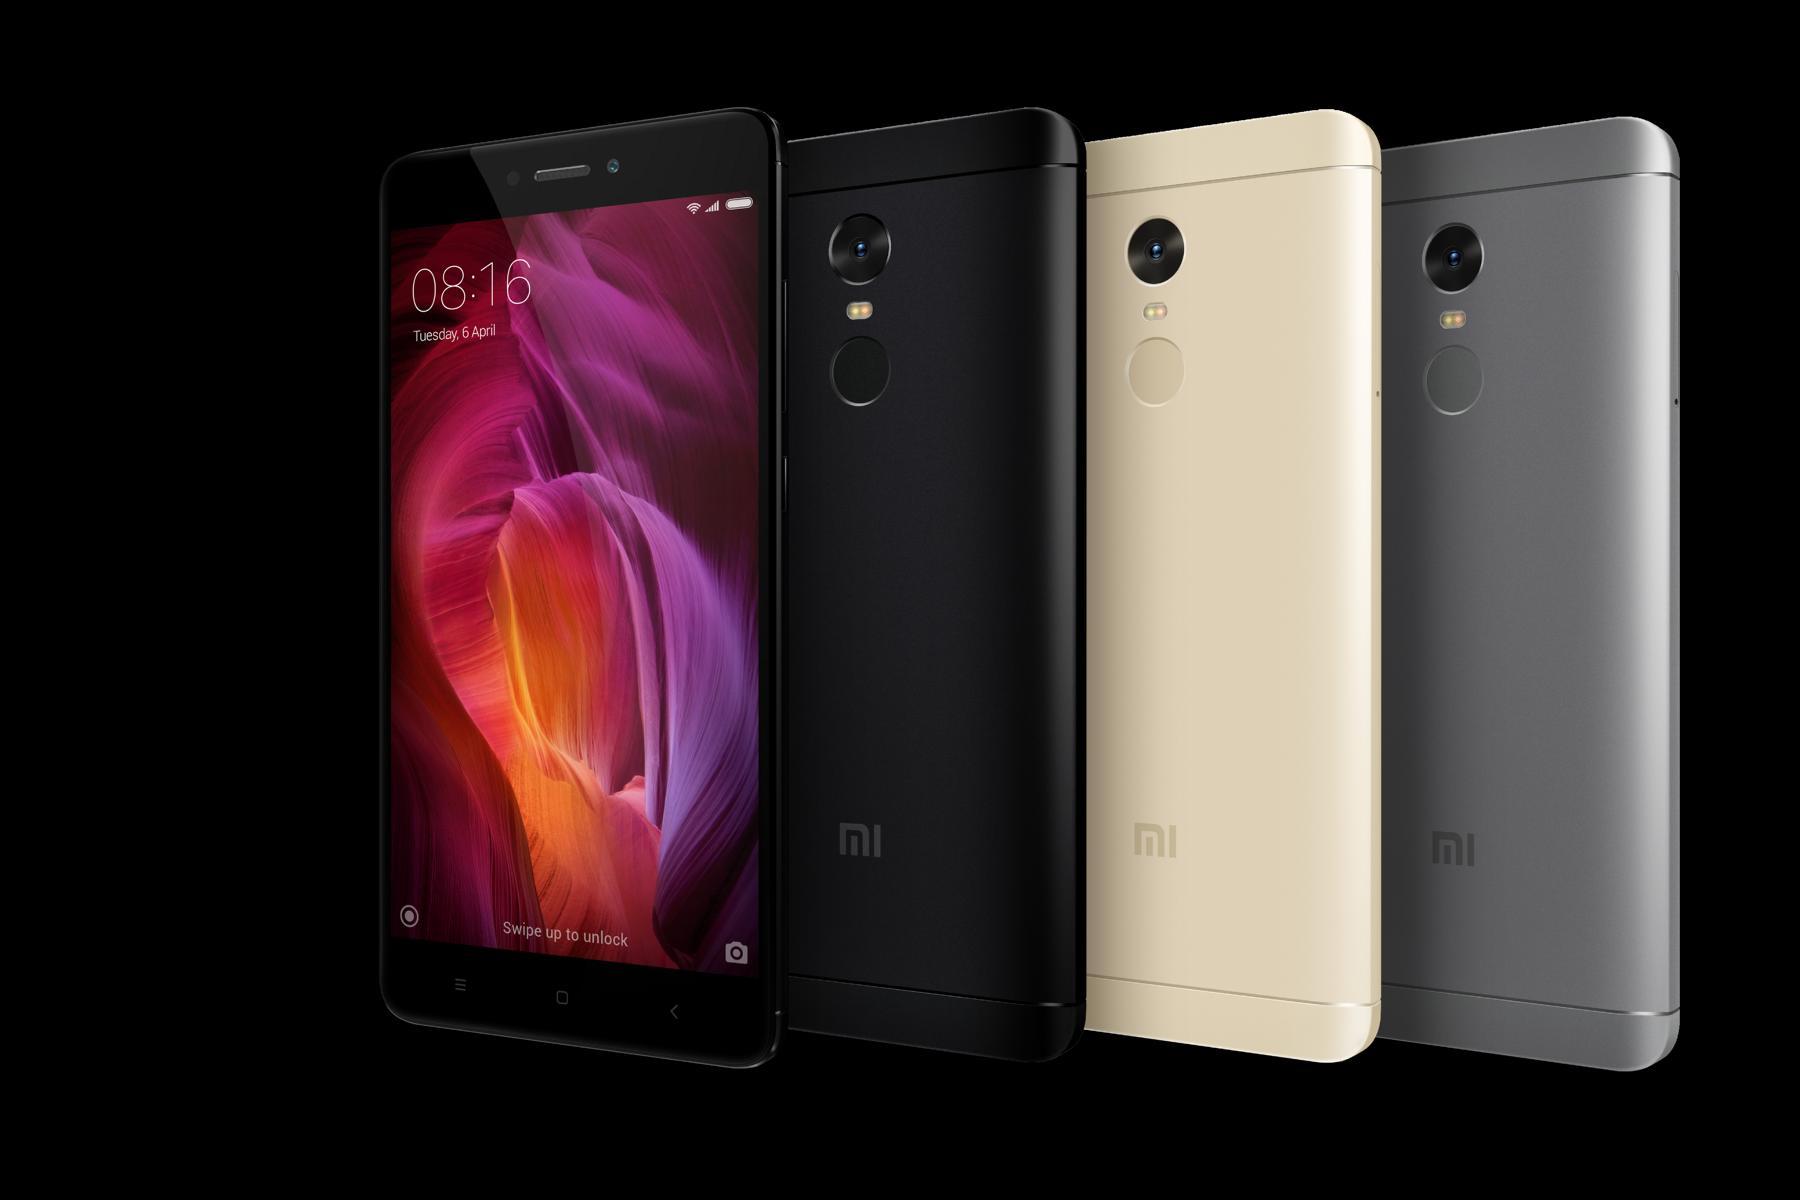 Xiaomi Redmi Note 4 4x Mit Band 20 Global Version New 3 64gb India